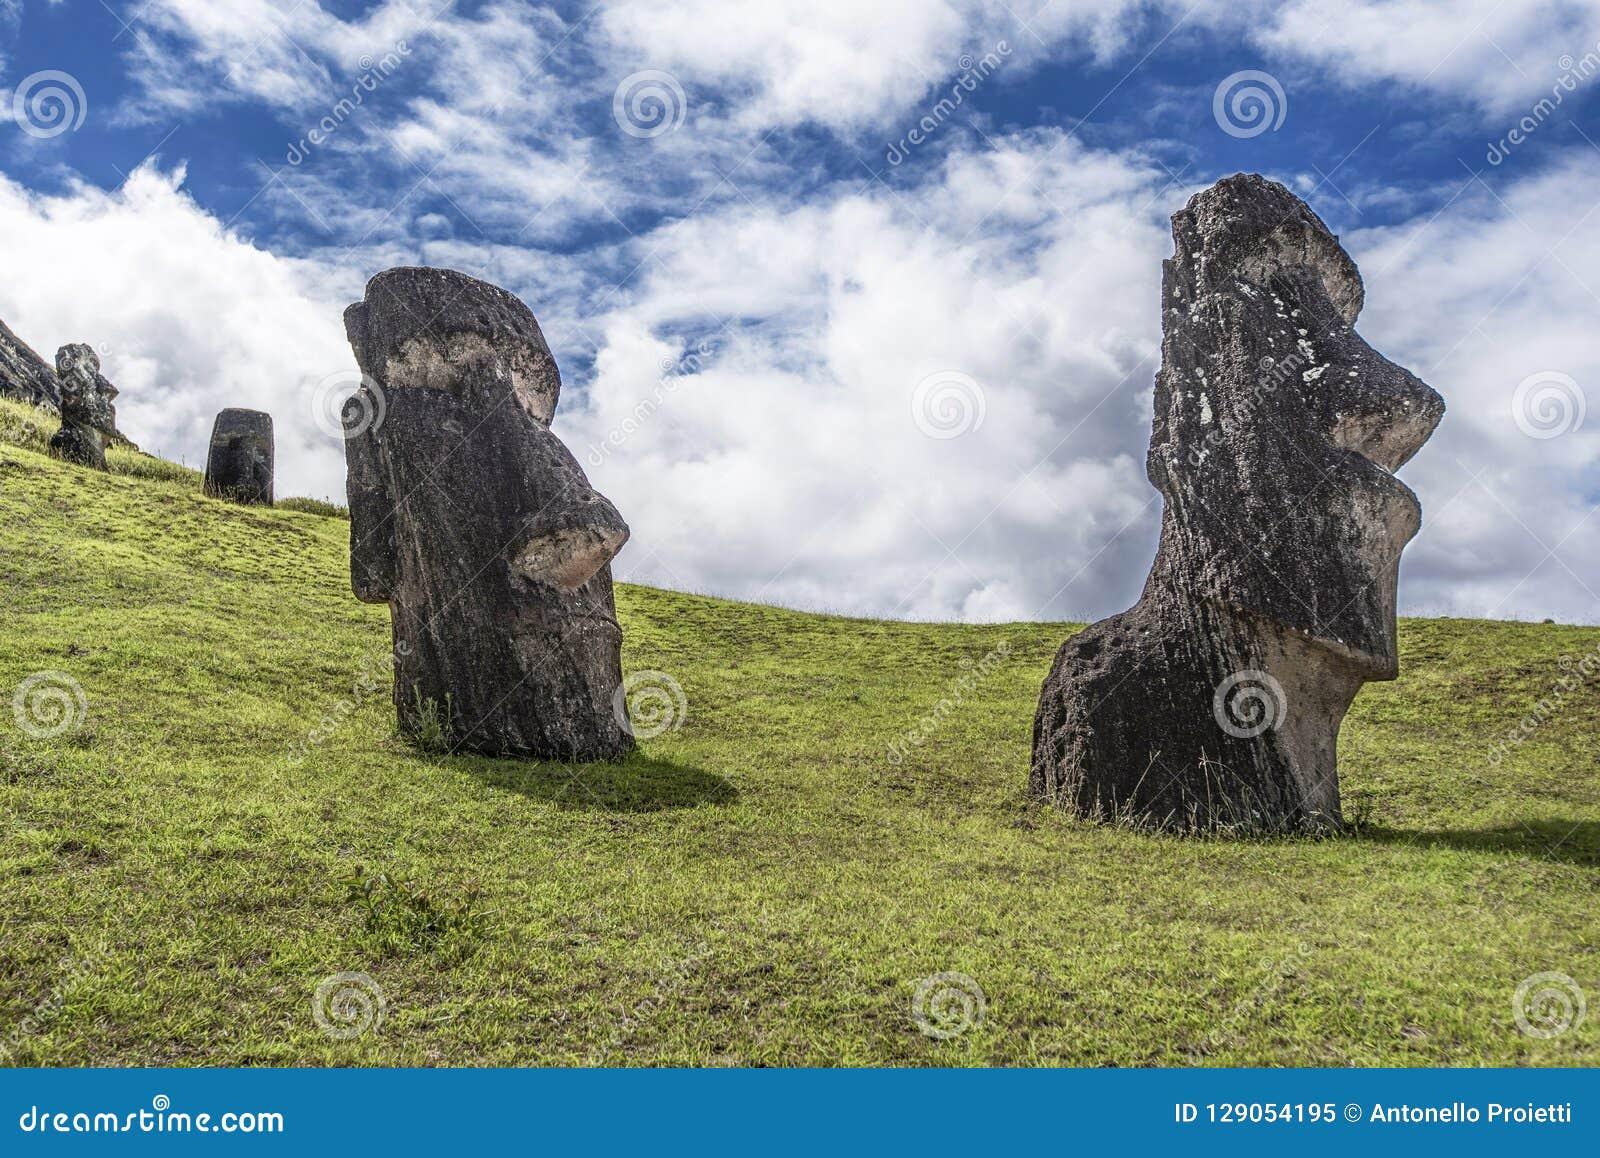 Pair of underground moai on the Rano Raraku hill